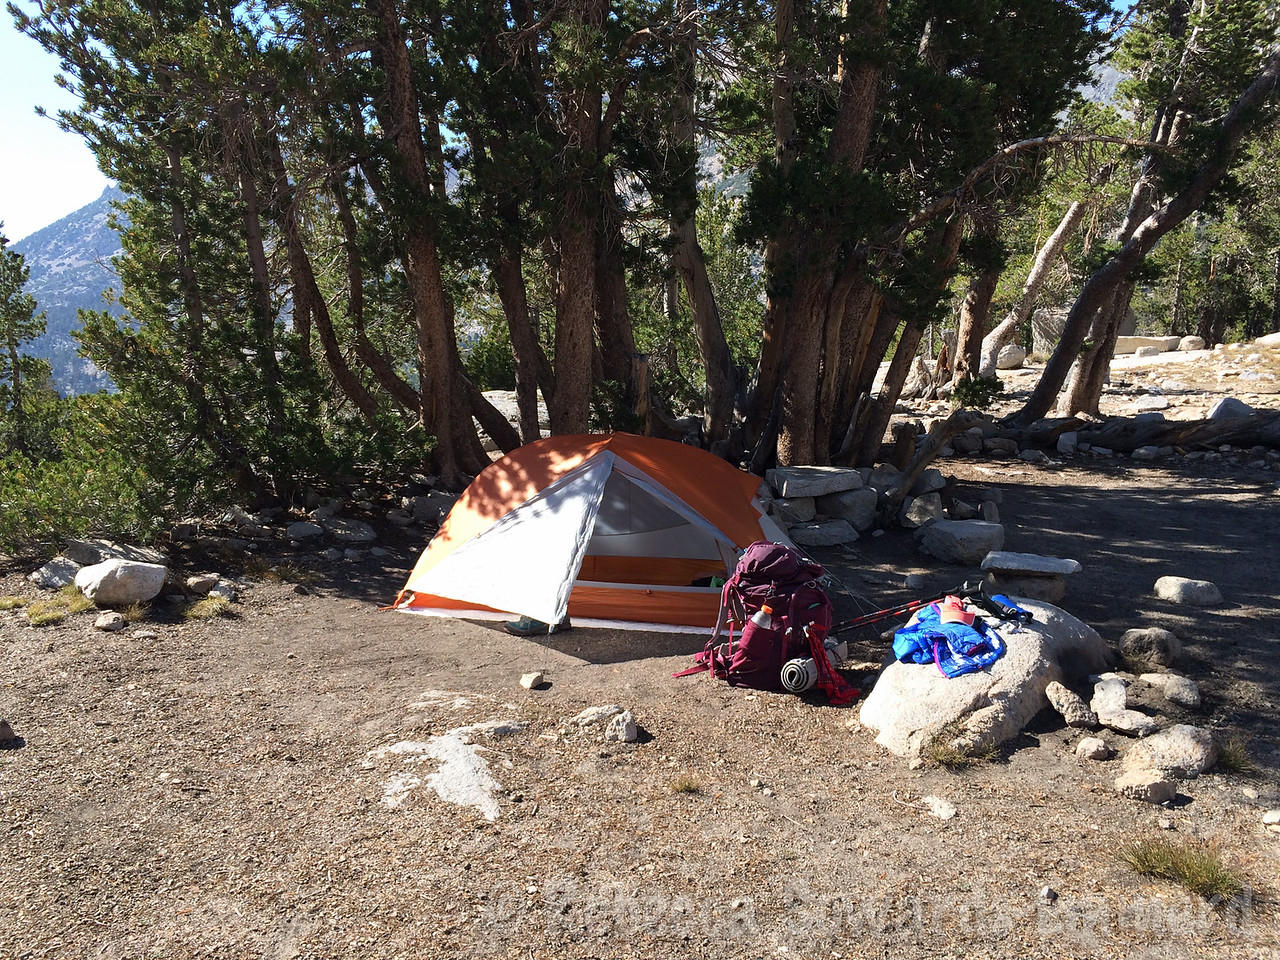 Same campsite!